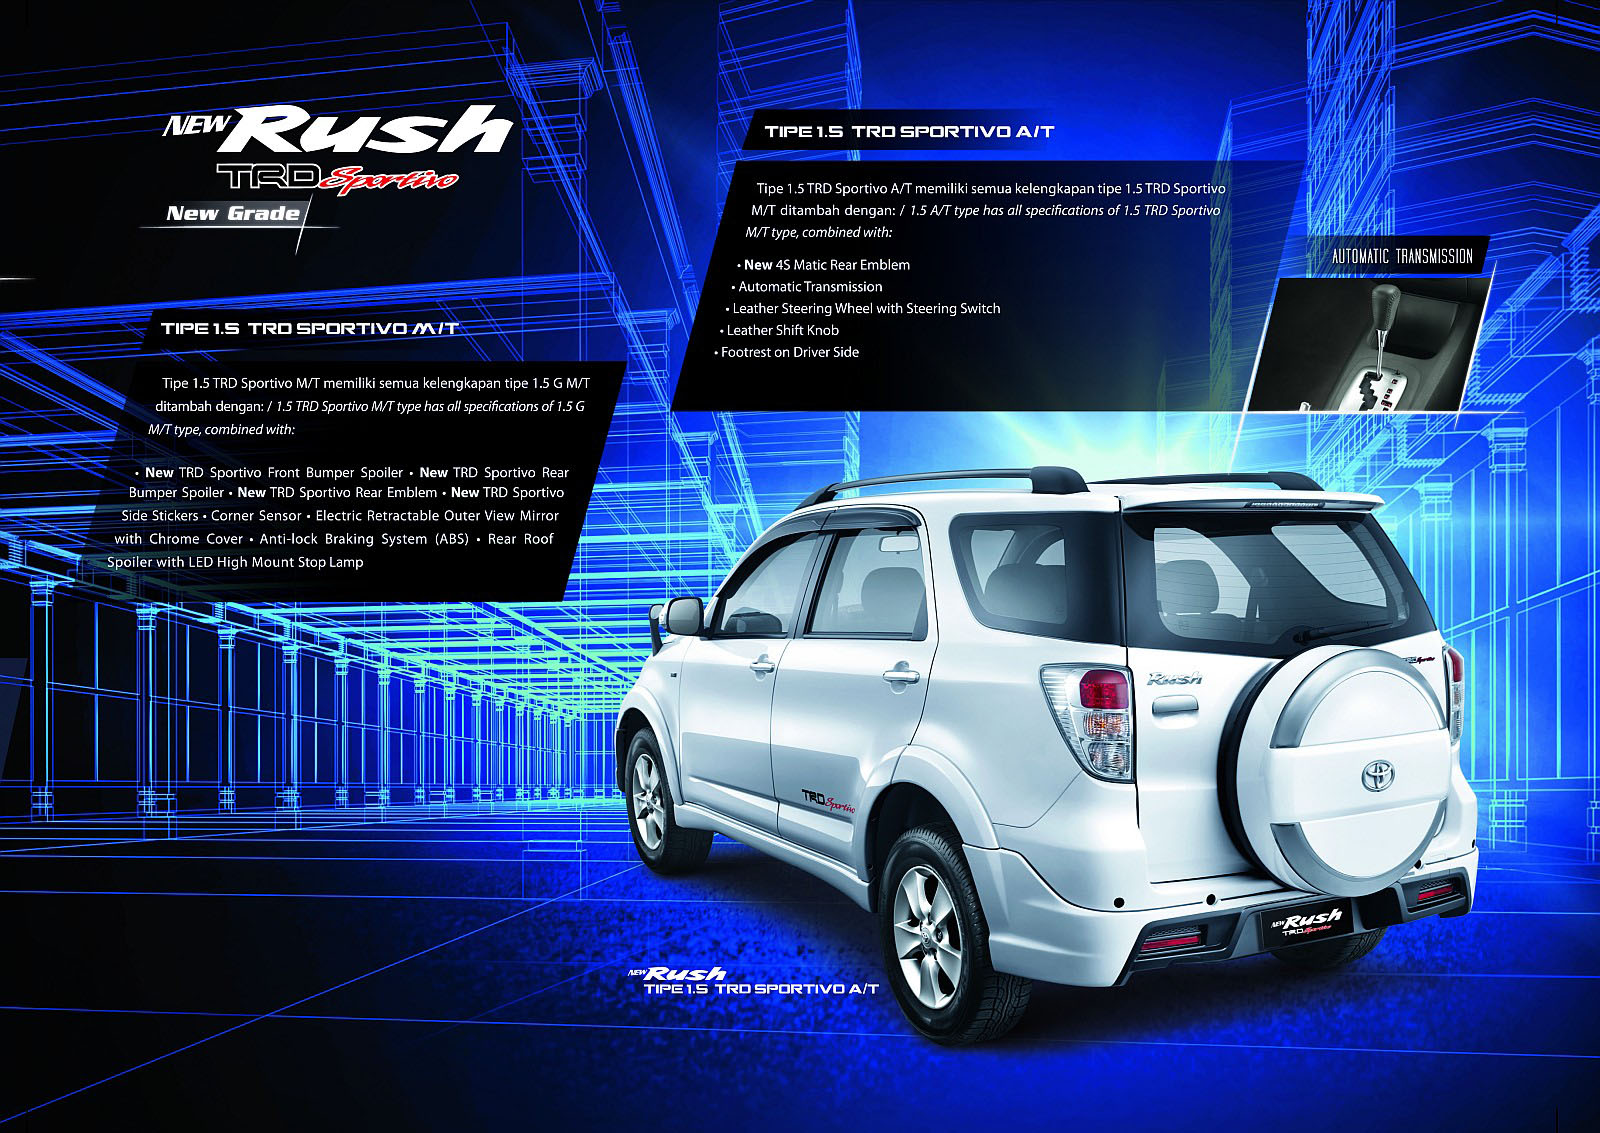 Brosur New Rush 2013